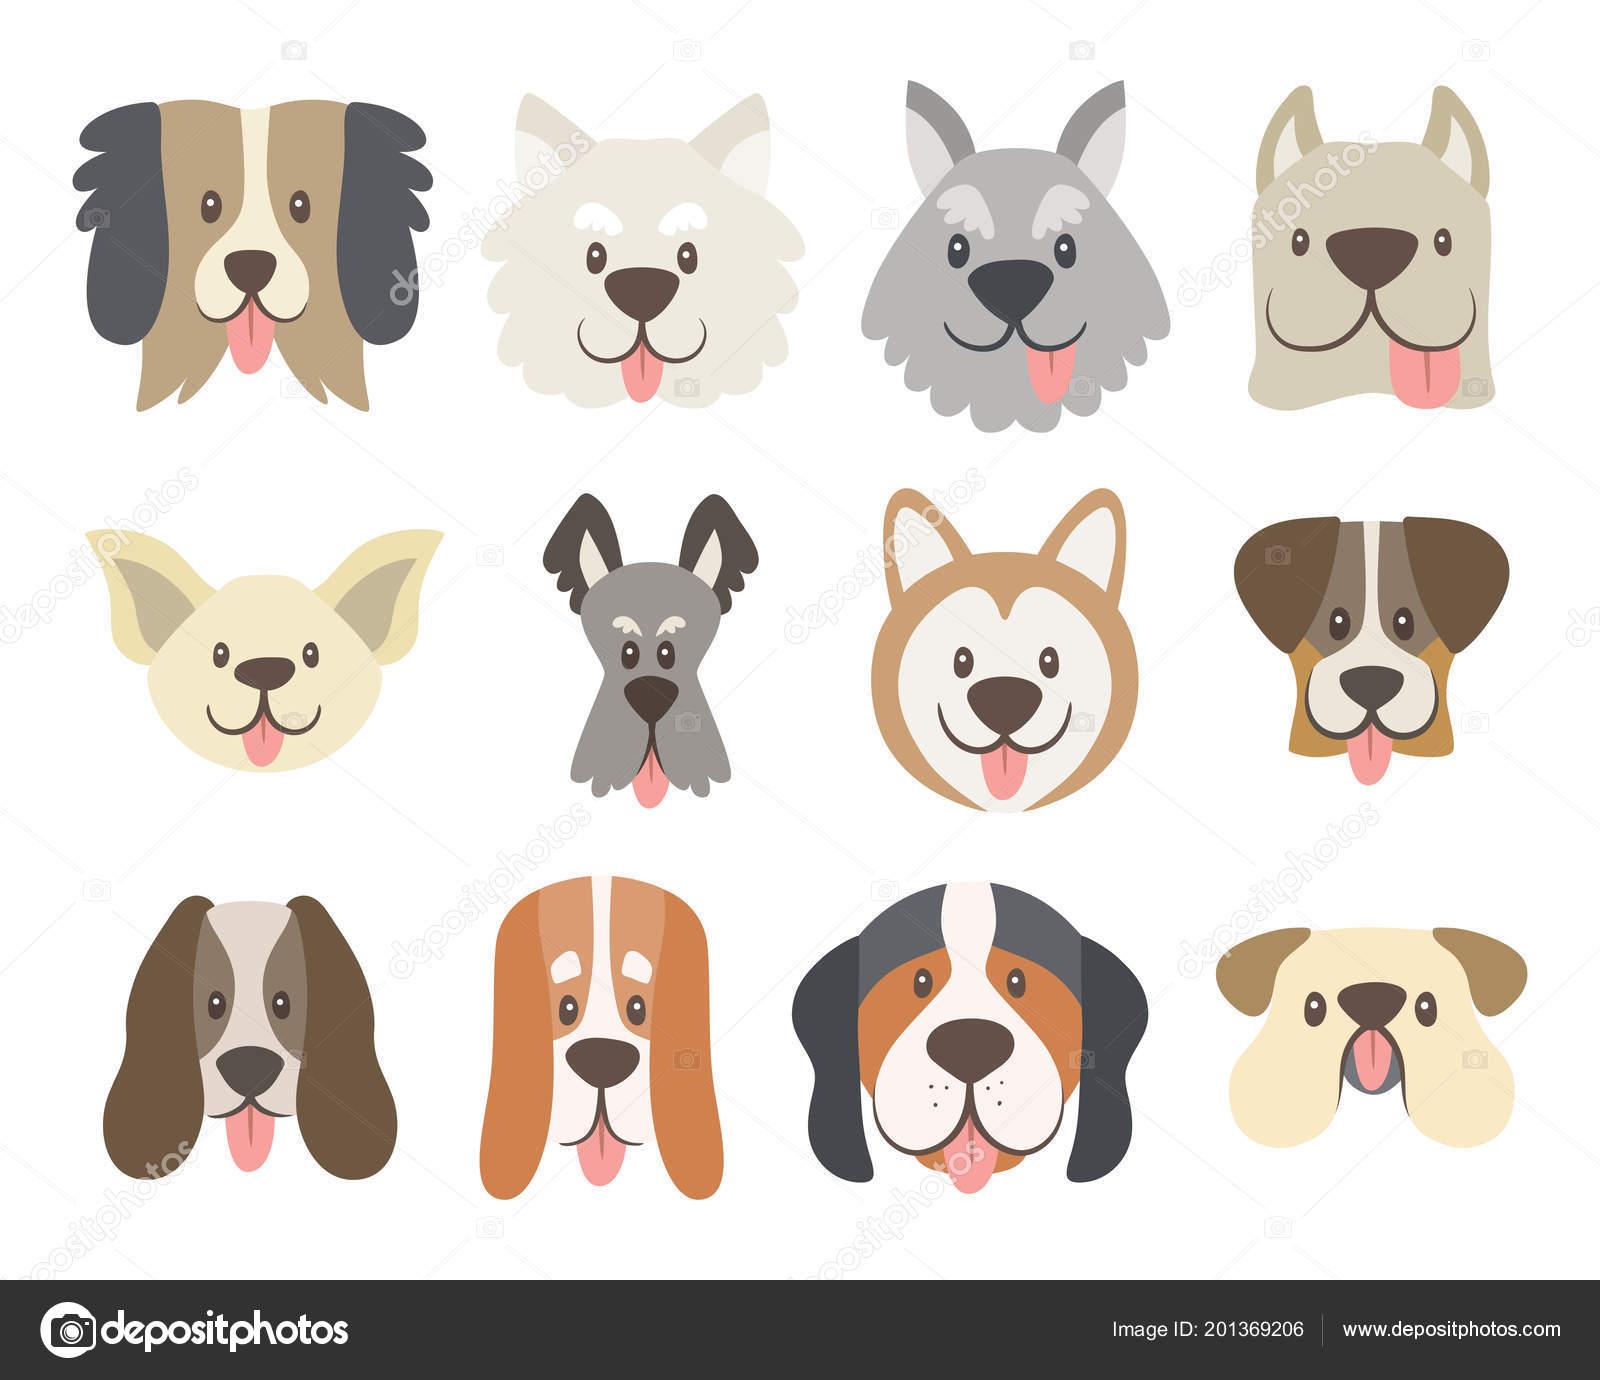 Perro Enfrenta Colección Cute Dibujos Animados Caras Perro Con